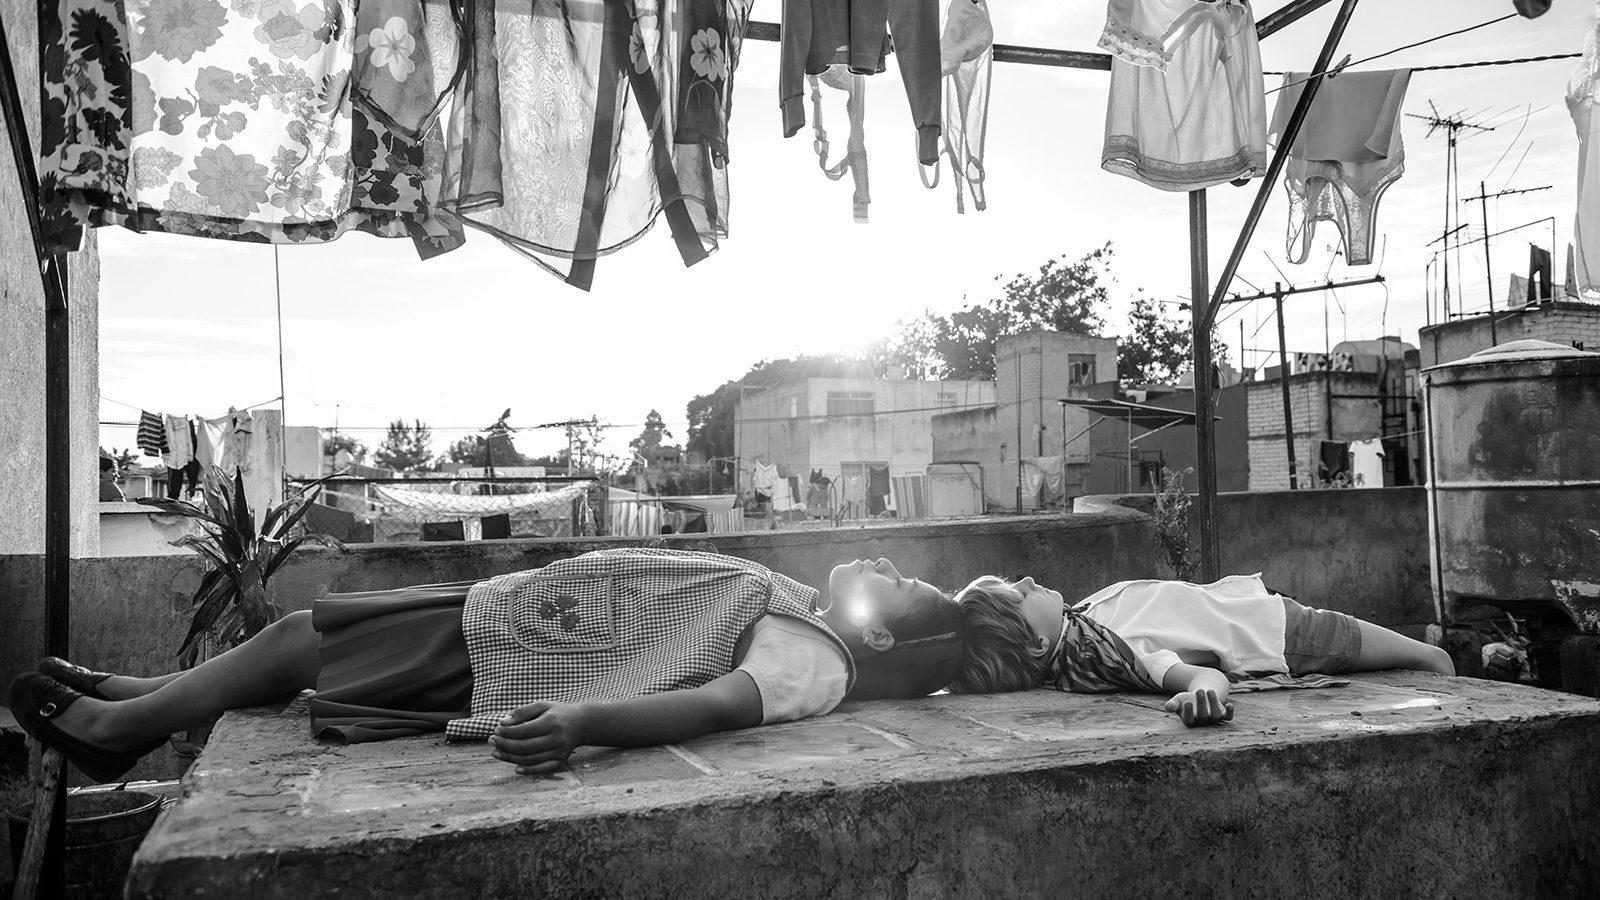 Actresses Yalitza Aparicio and Marina de Tavira on Embodying Alfonso Cuarón's Memories in 'Roma'